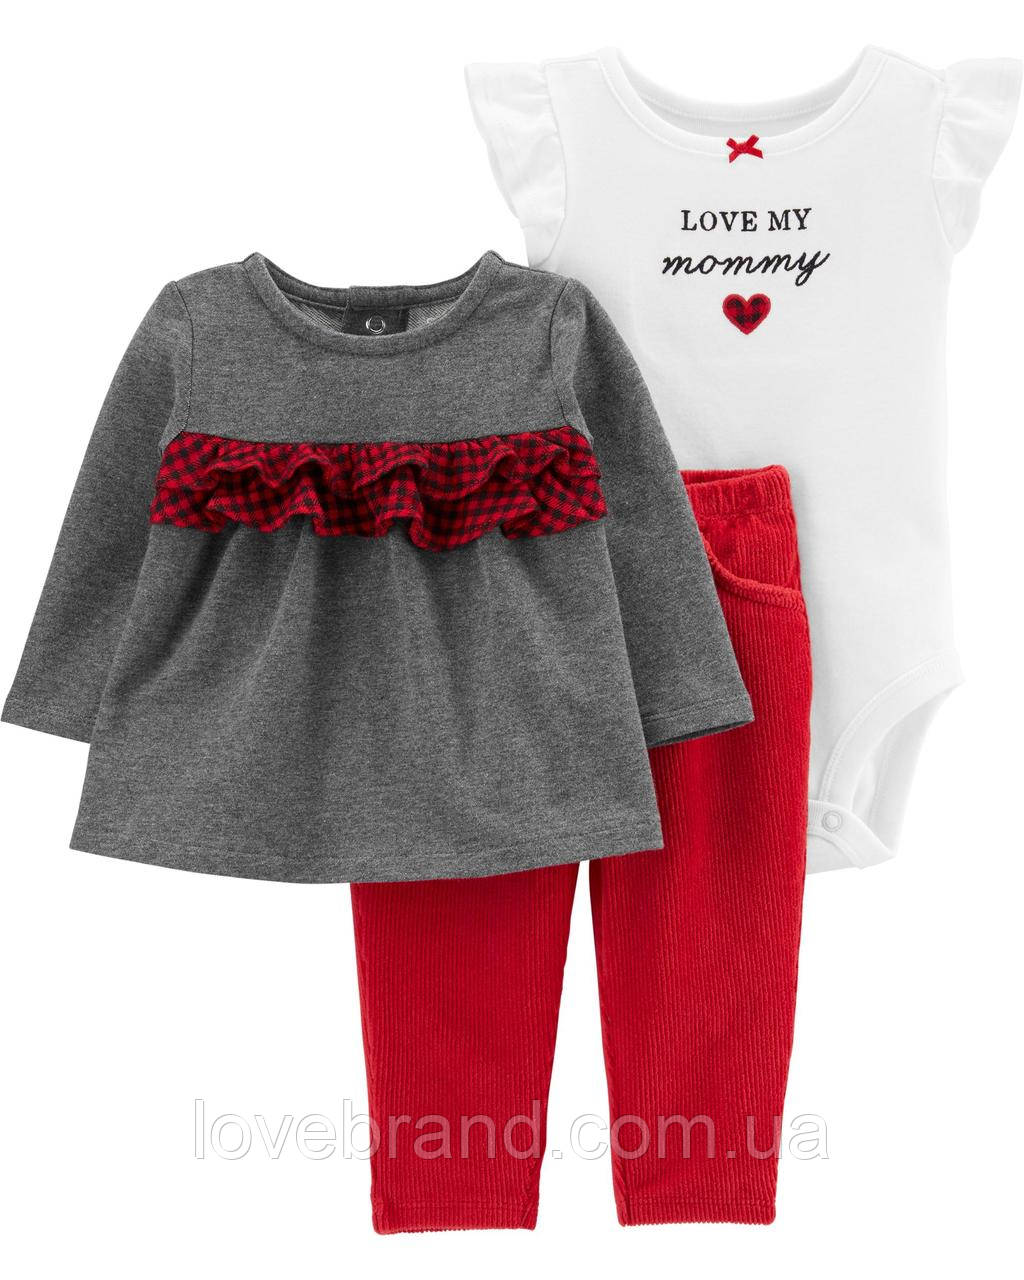 "Костюм для девочки Carter's ""Love my mommy""  картерс"